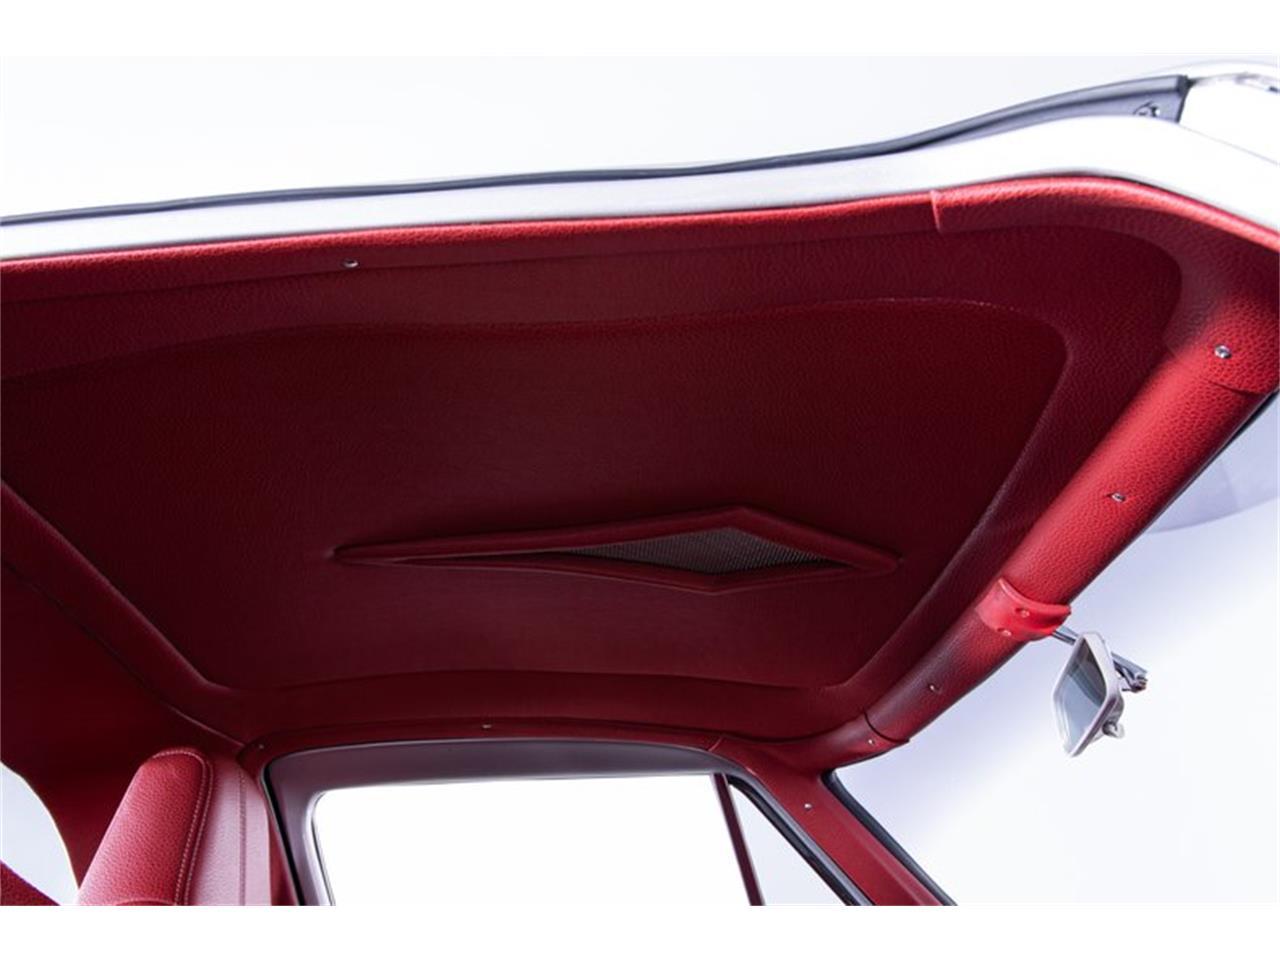 Large Picture of Classic '67 Chevrolet Corvette located in North Carolina - $189,900.00 - Q4OM